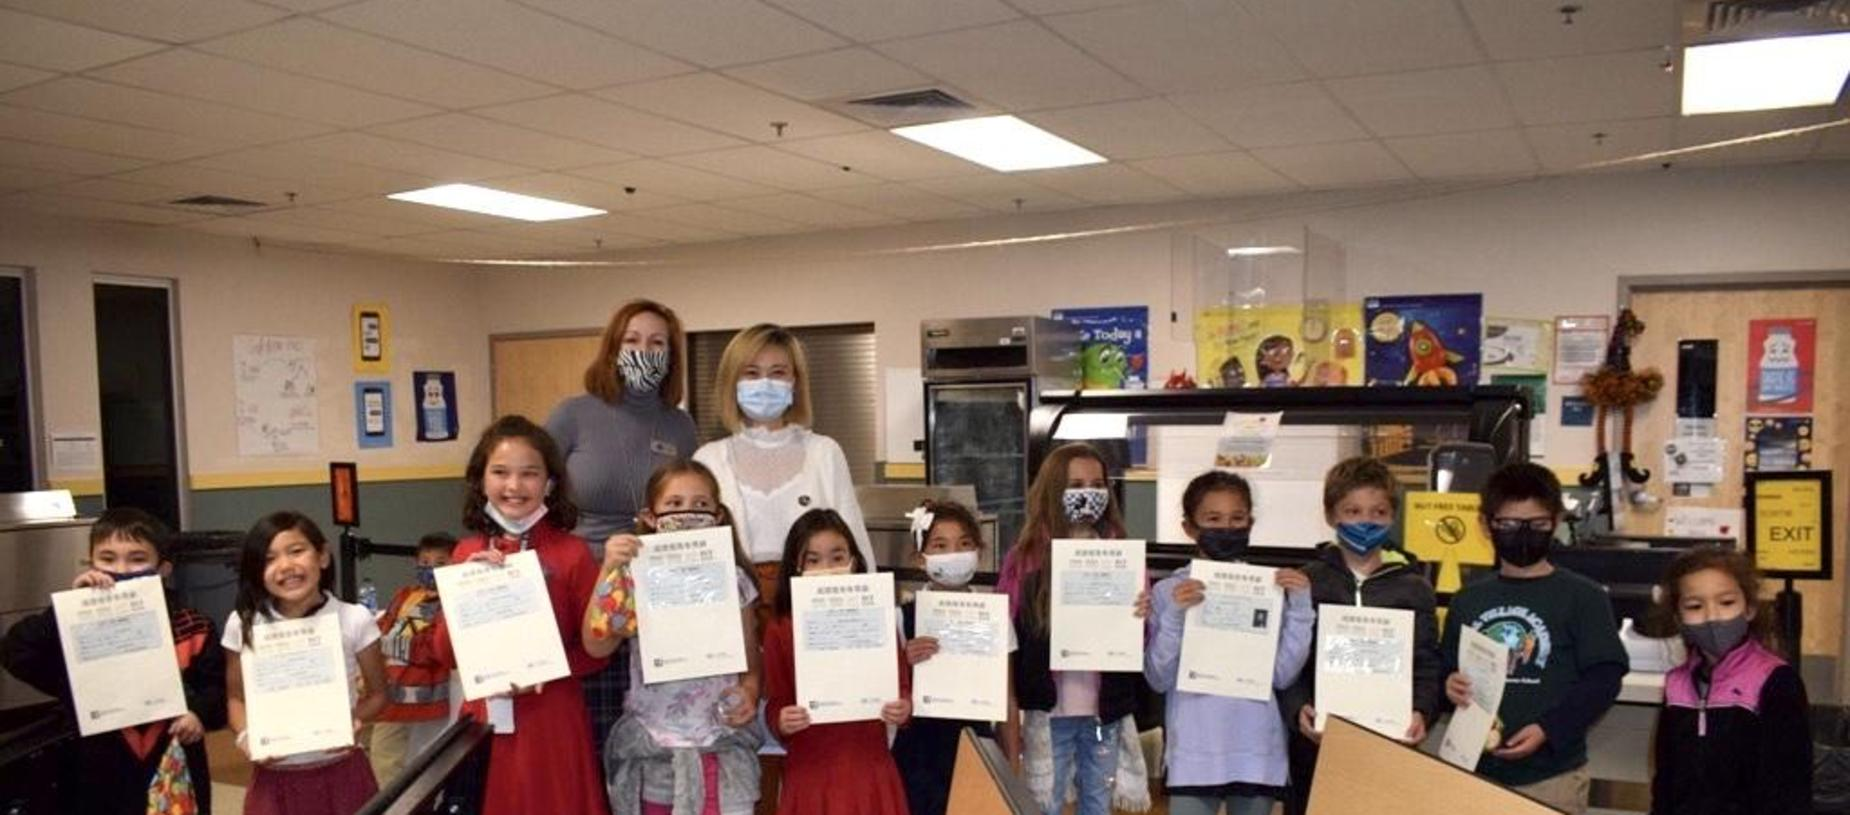 students receiving language proficiency awards